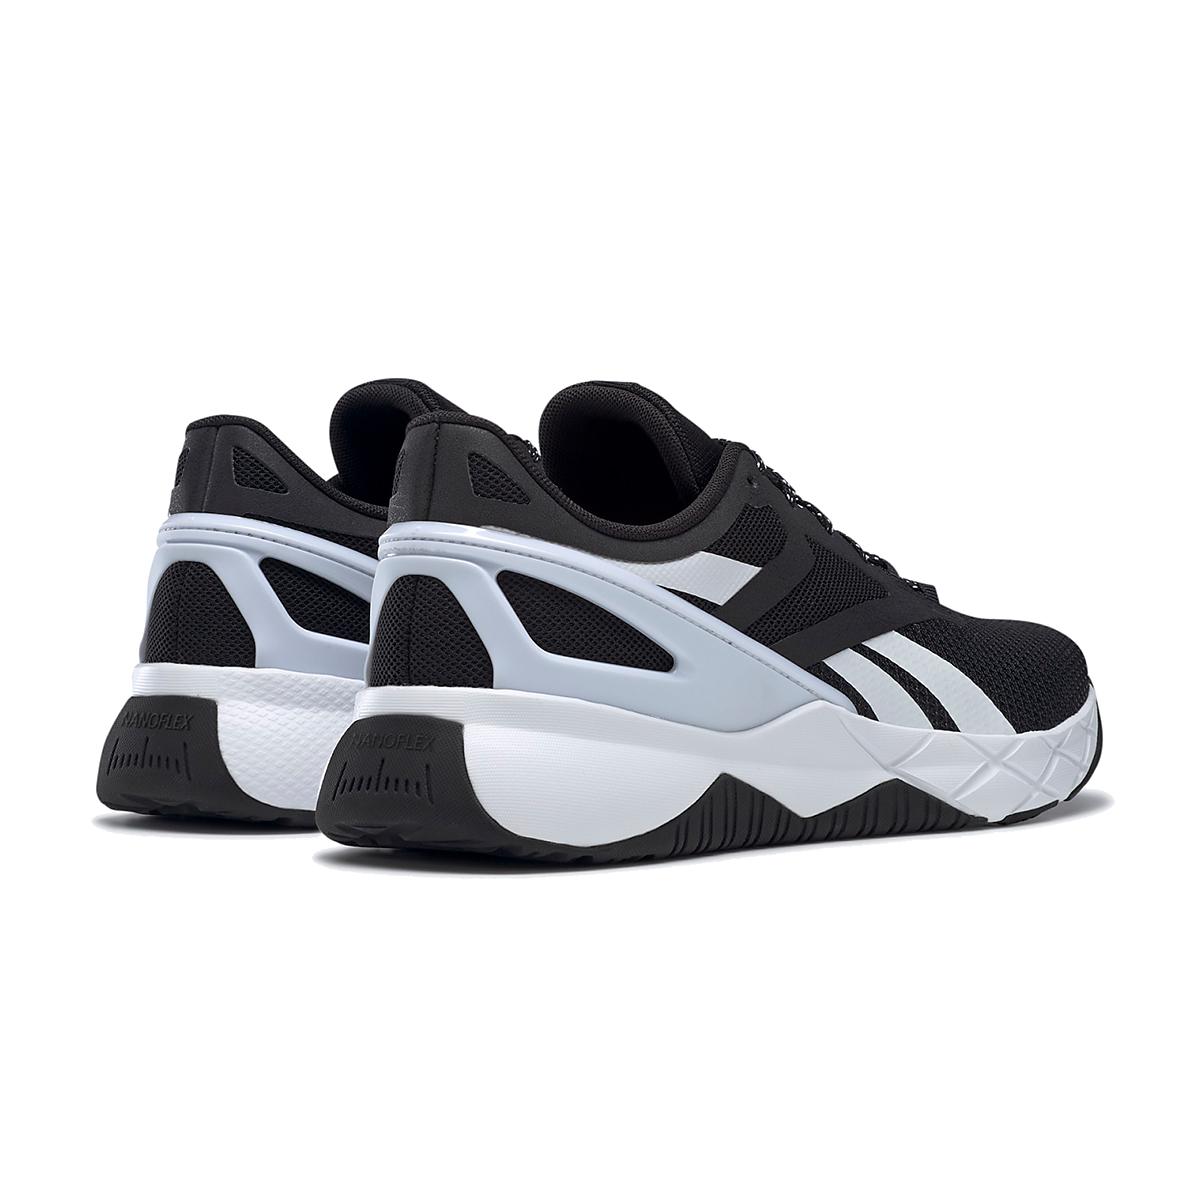 Men's Reebok Nanoflex TR Training Shoe - Color: Core Black/White/Core Black - Size: 6.5 - Width: Regular, Core Black/White/Core Black, large, image 4